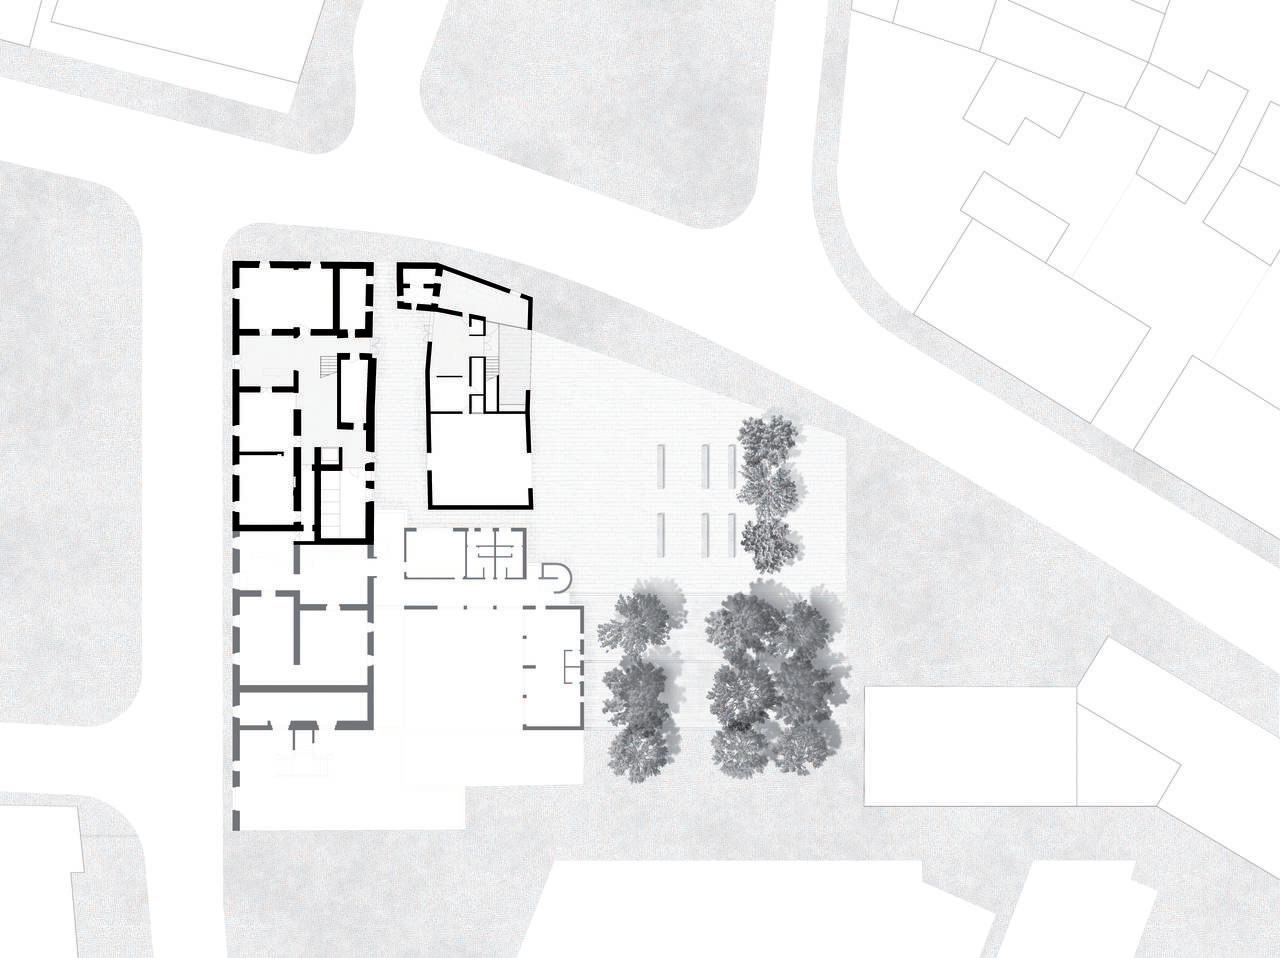 A11 Planta piso 0